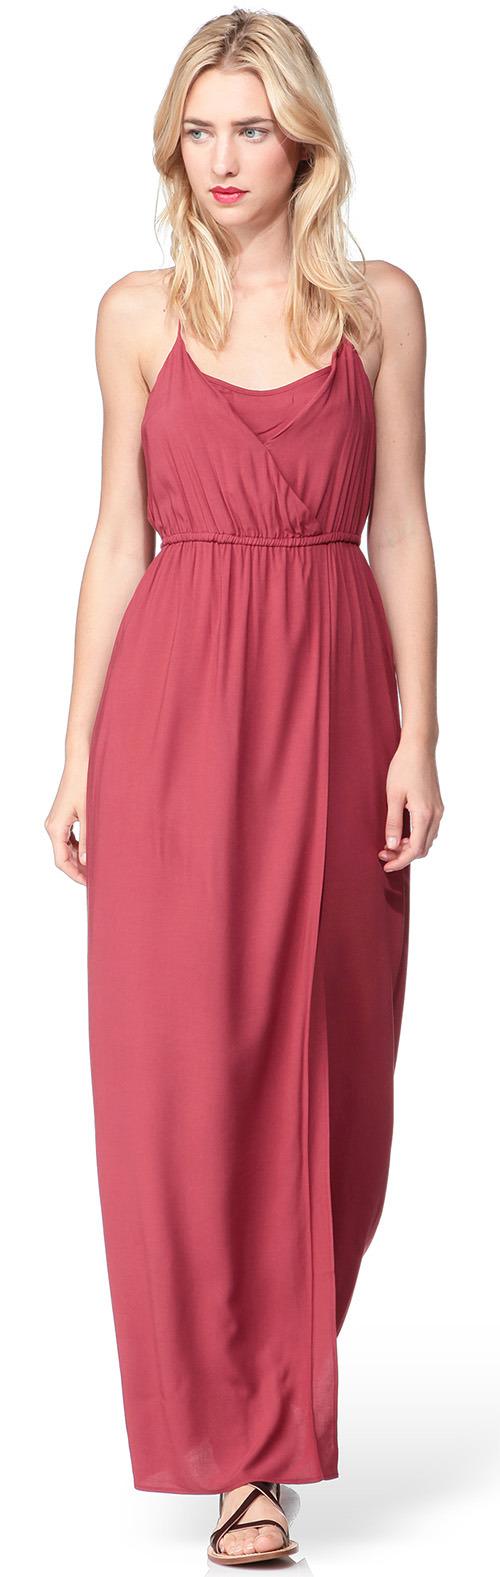 Robe longue rose Vero Moda